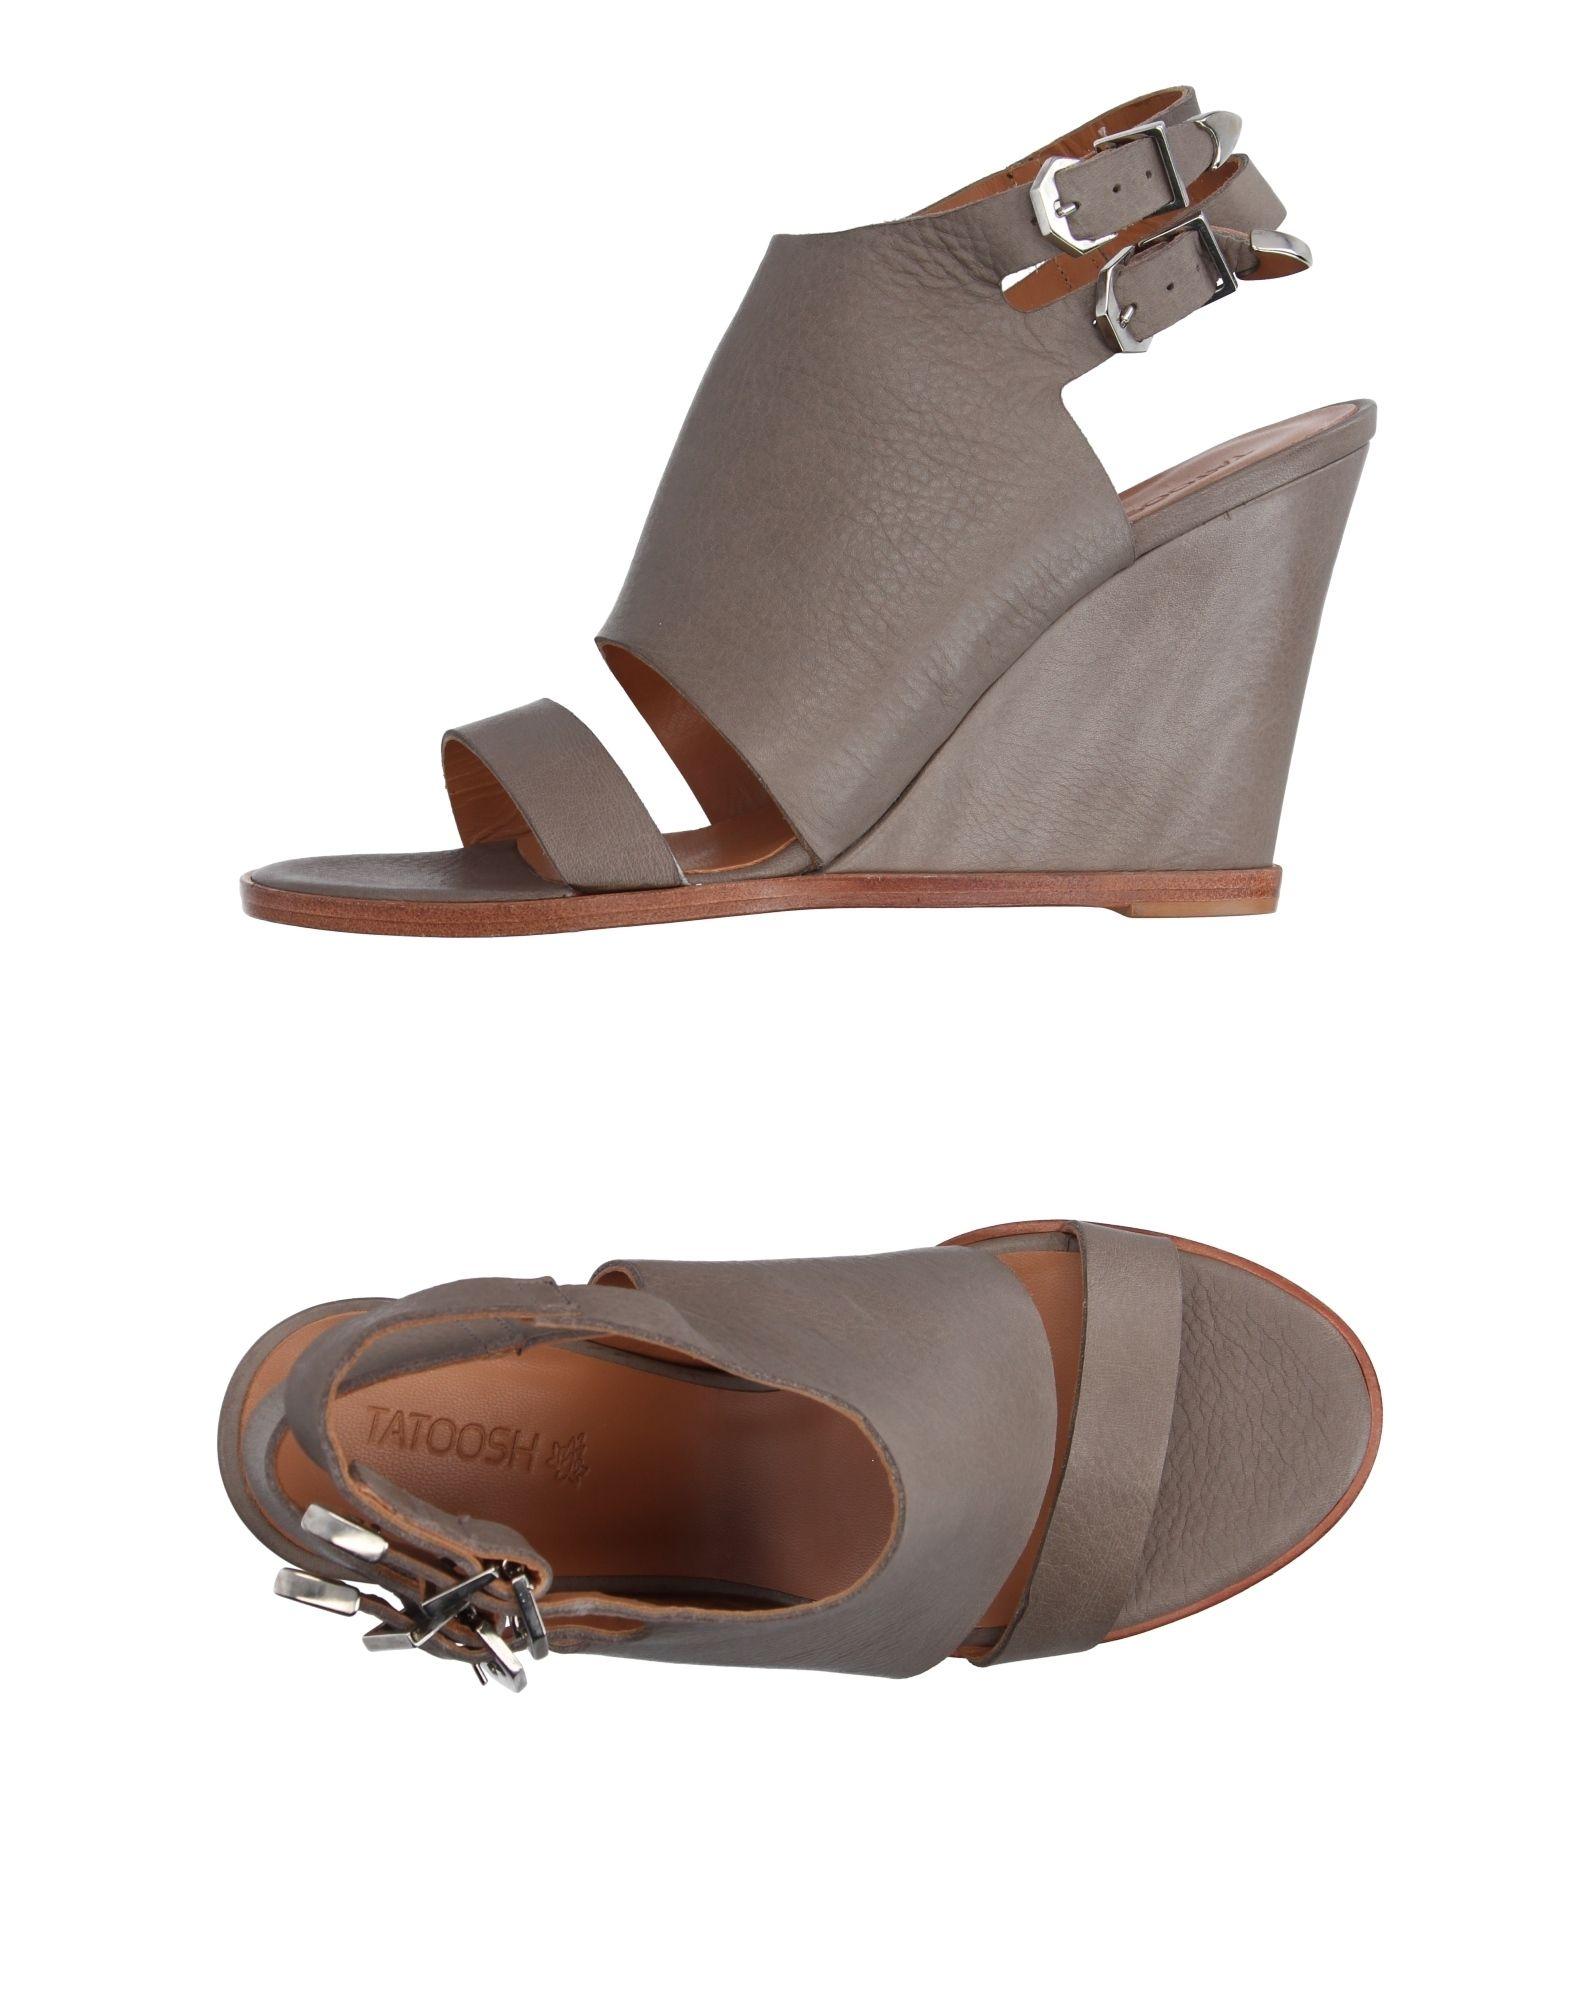 TATOOSH Sandals in Grey